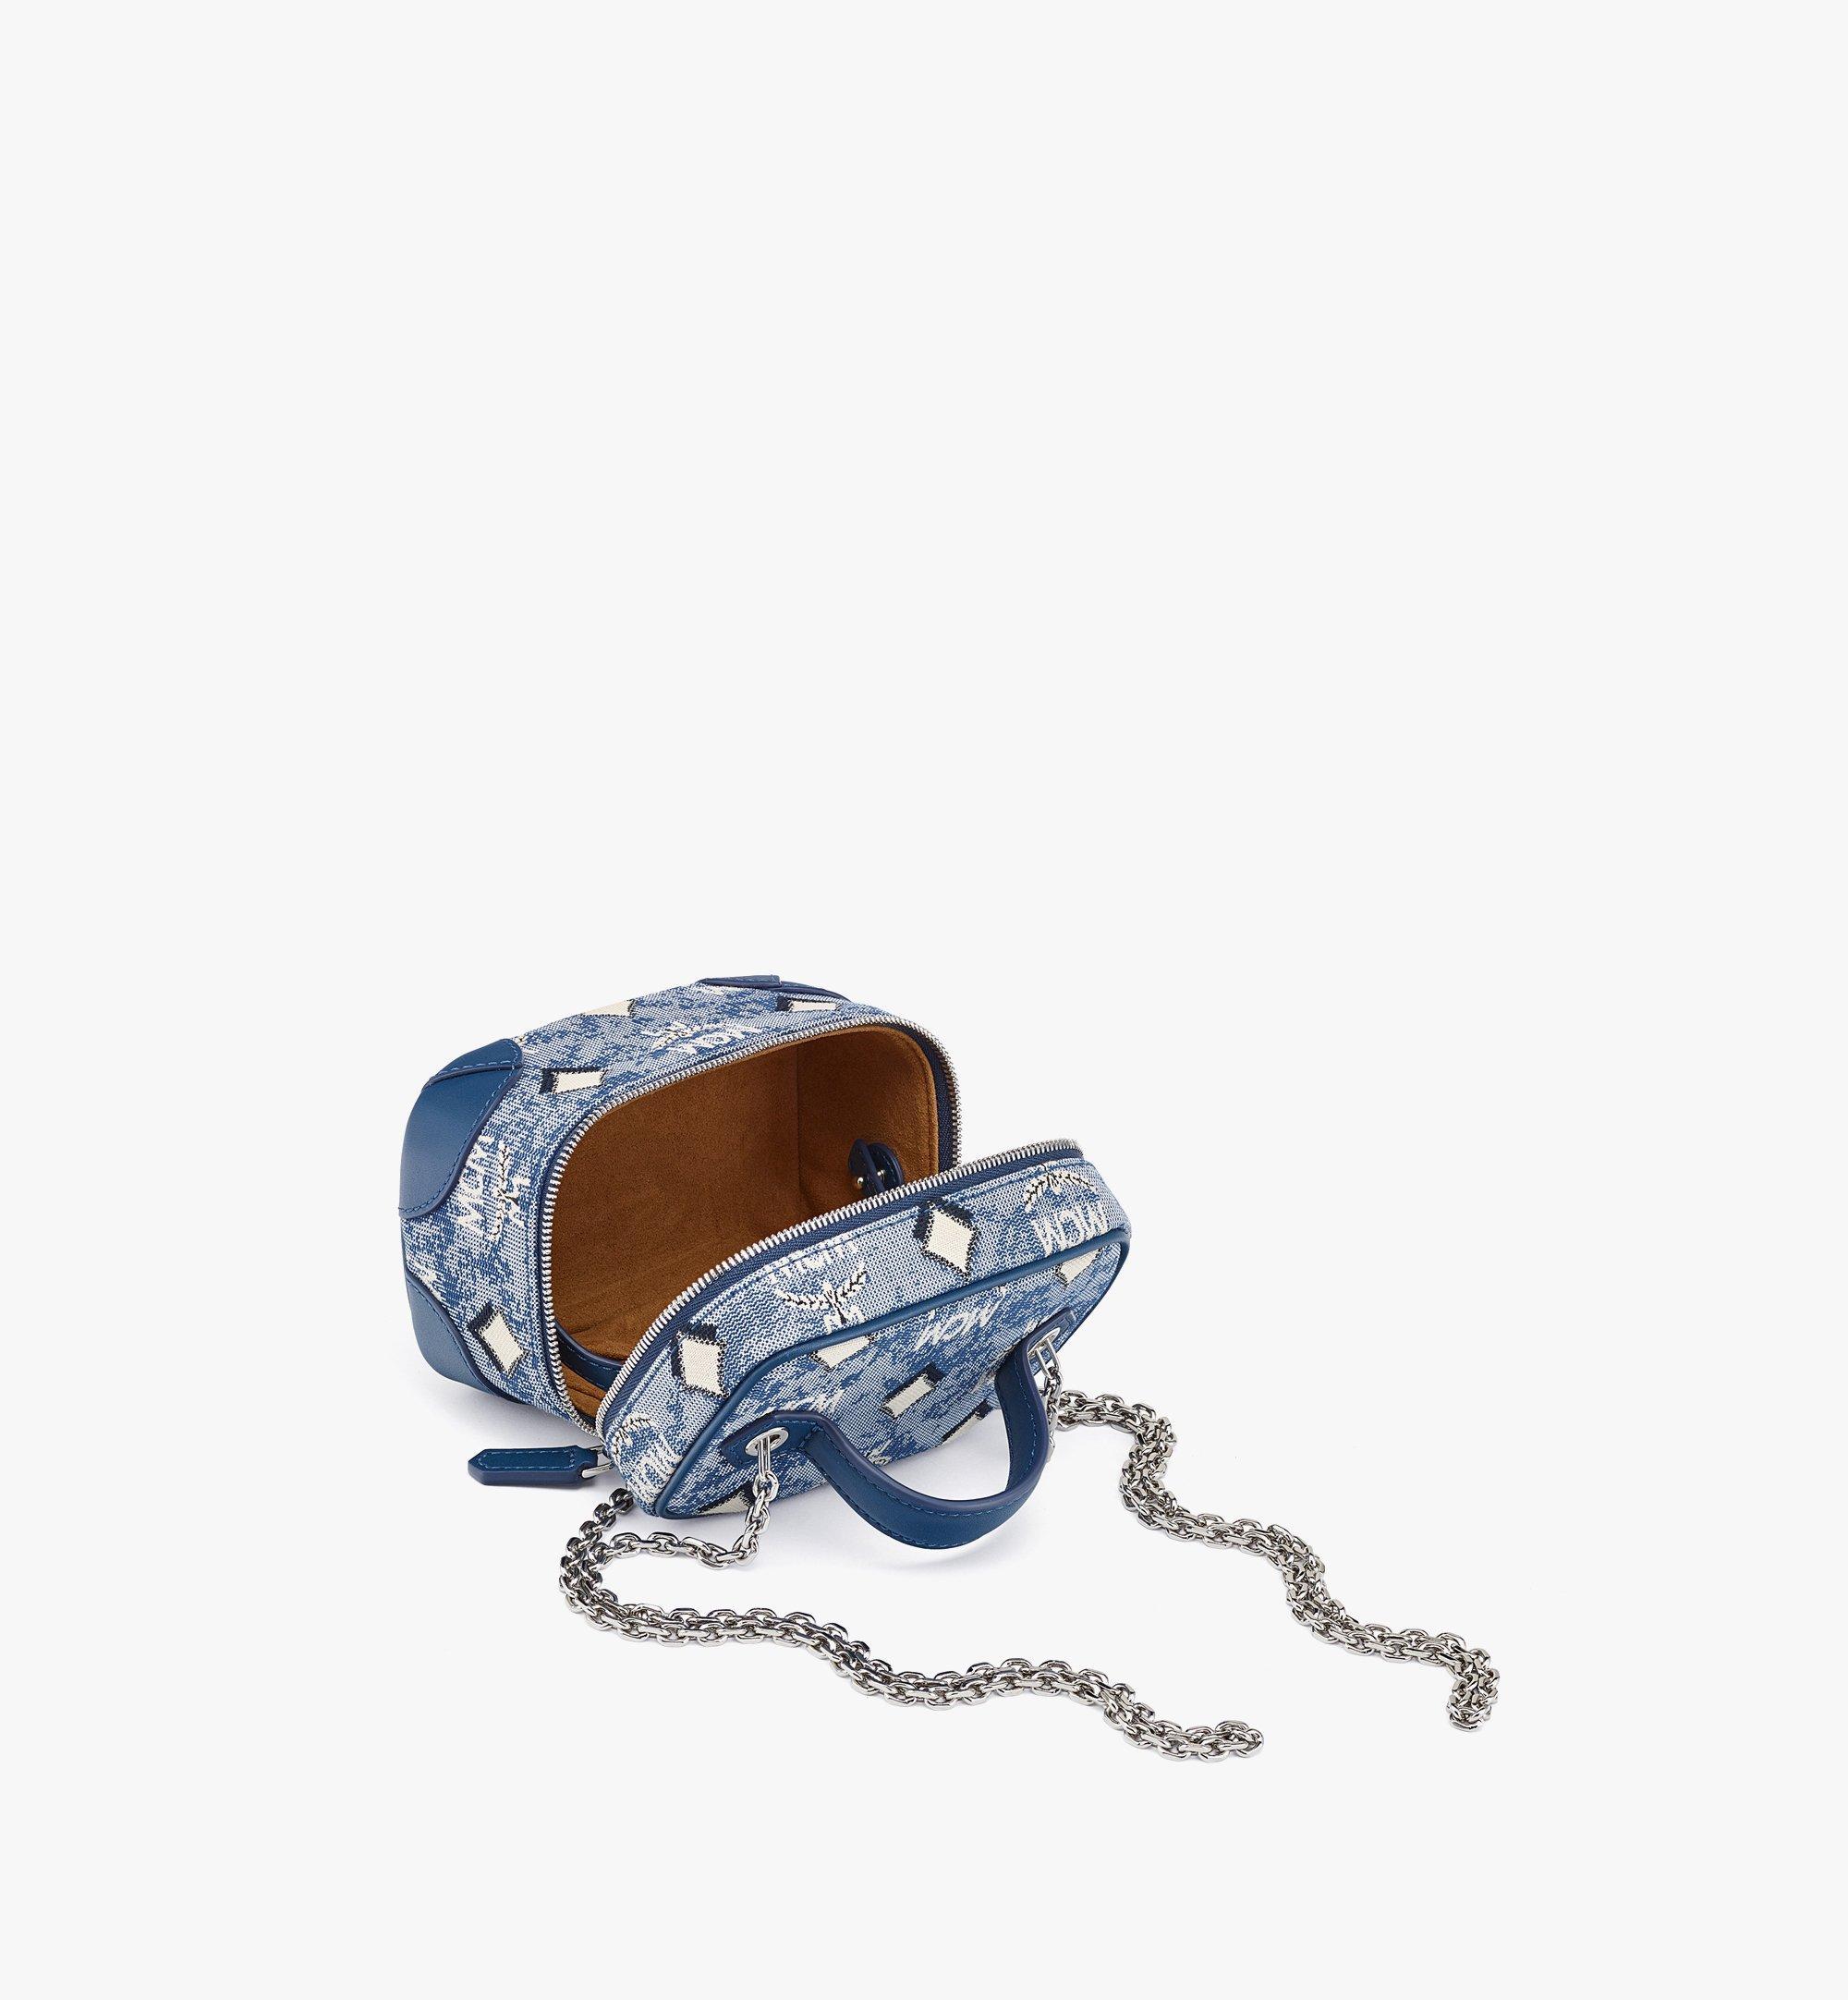 MCM Rockstar Vanity Case in Vintage Jacquard Monogram Blue MWRBATQ02LU001 Alternate View 2